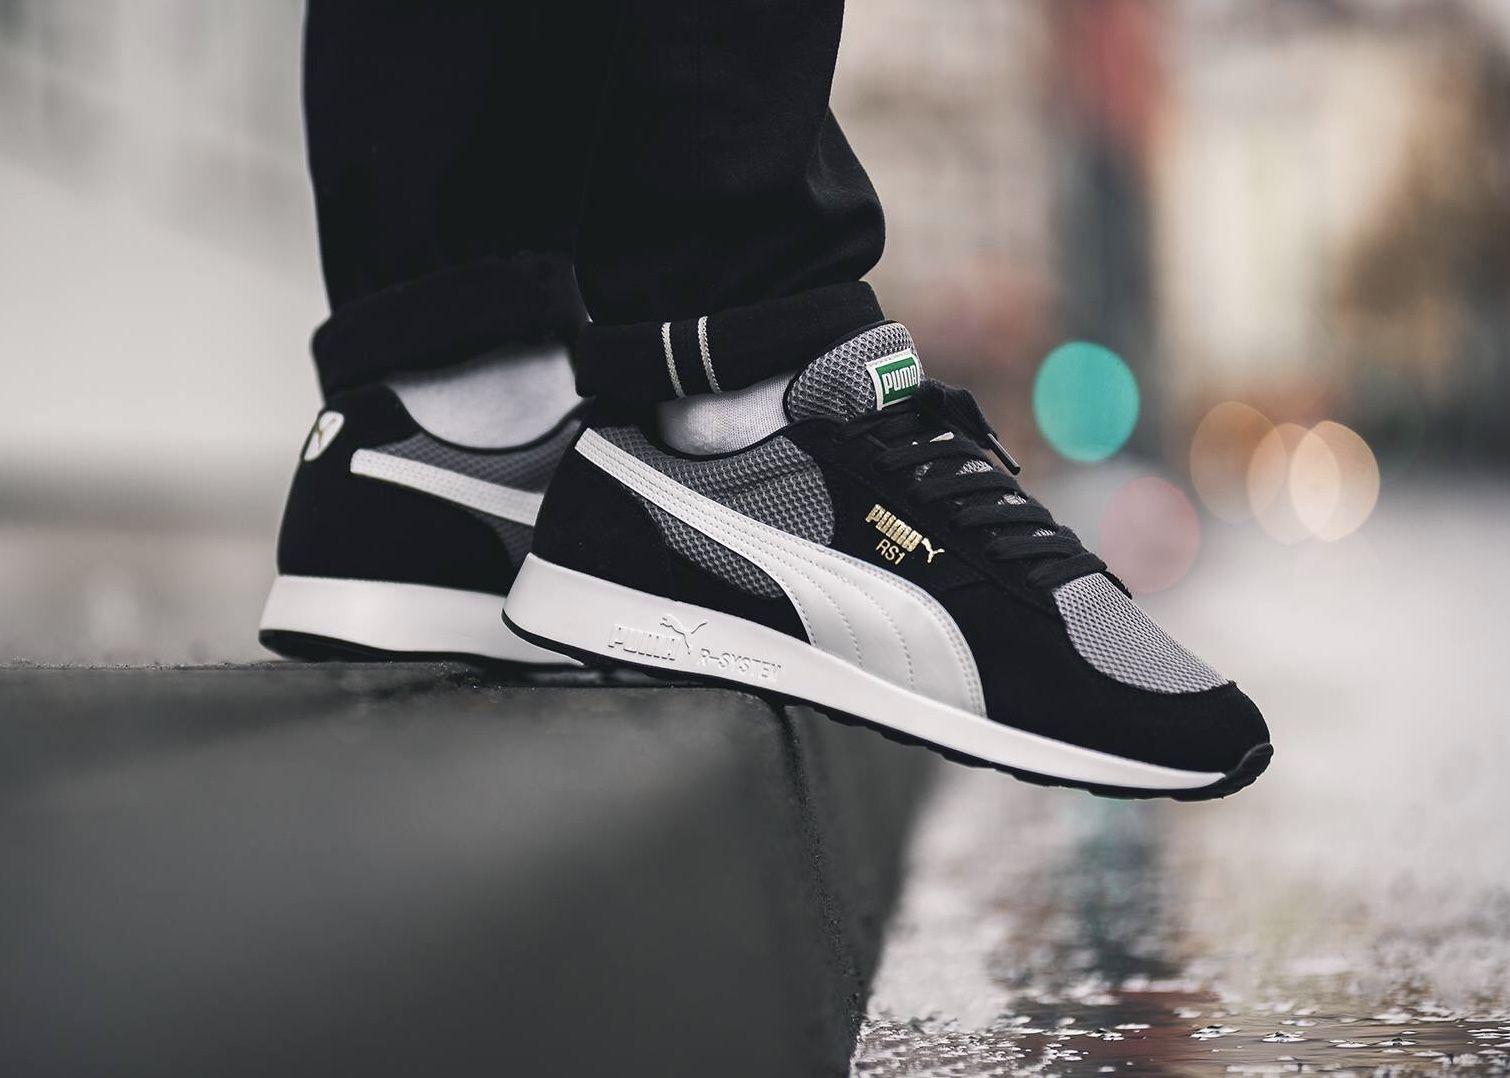 Puma RS-1 | Sneakers, Puma, Puma sneaker